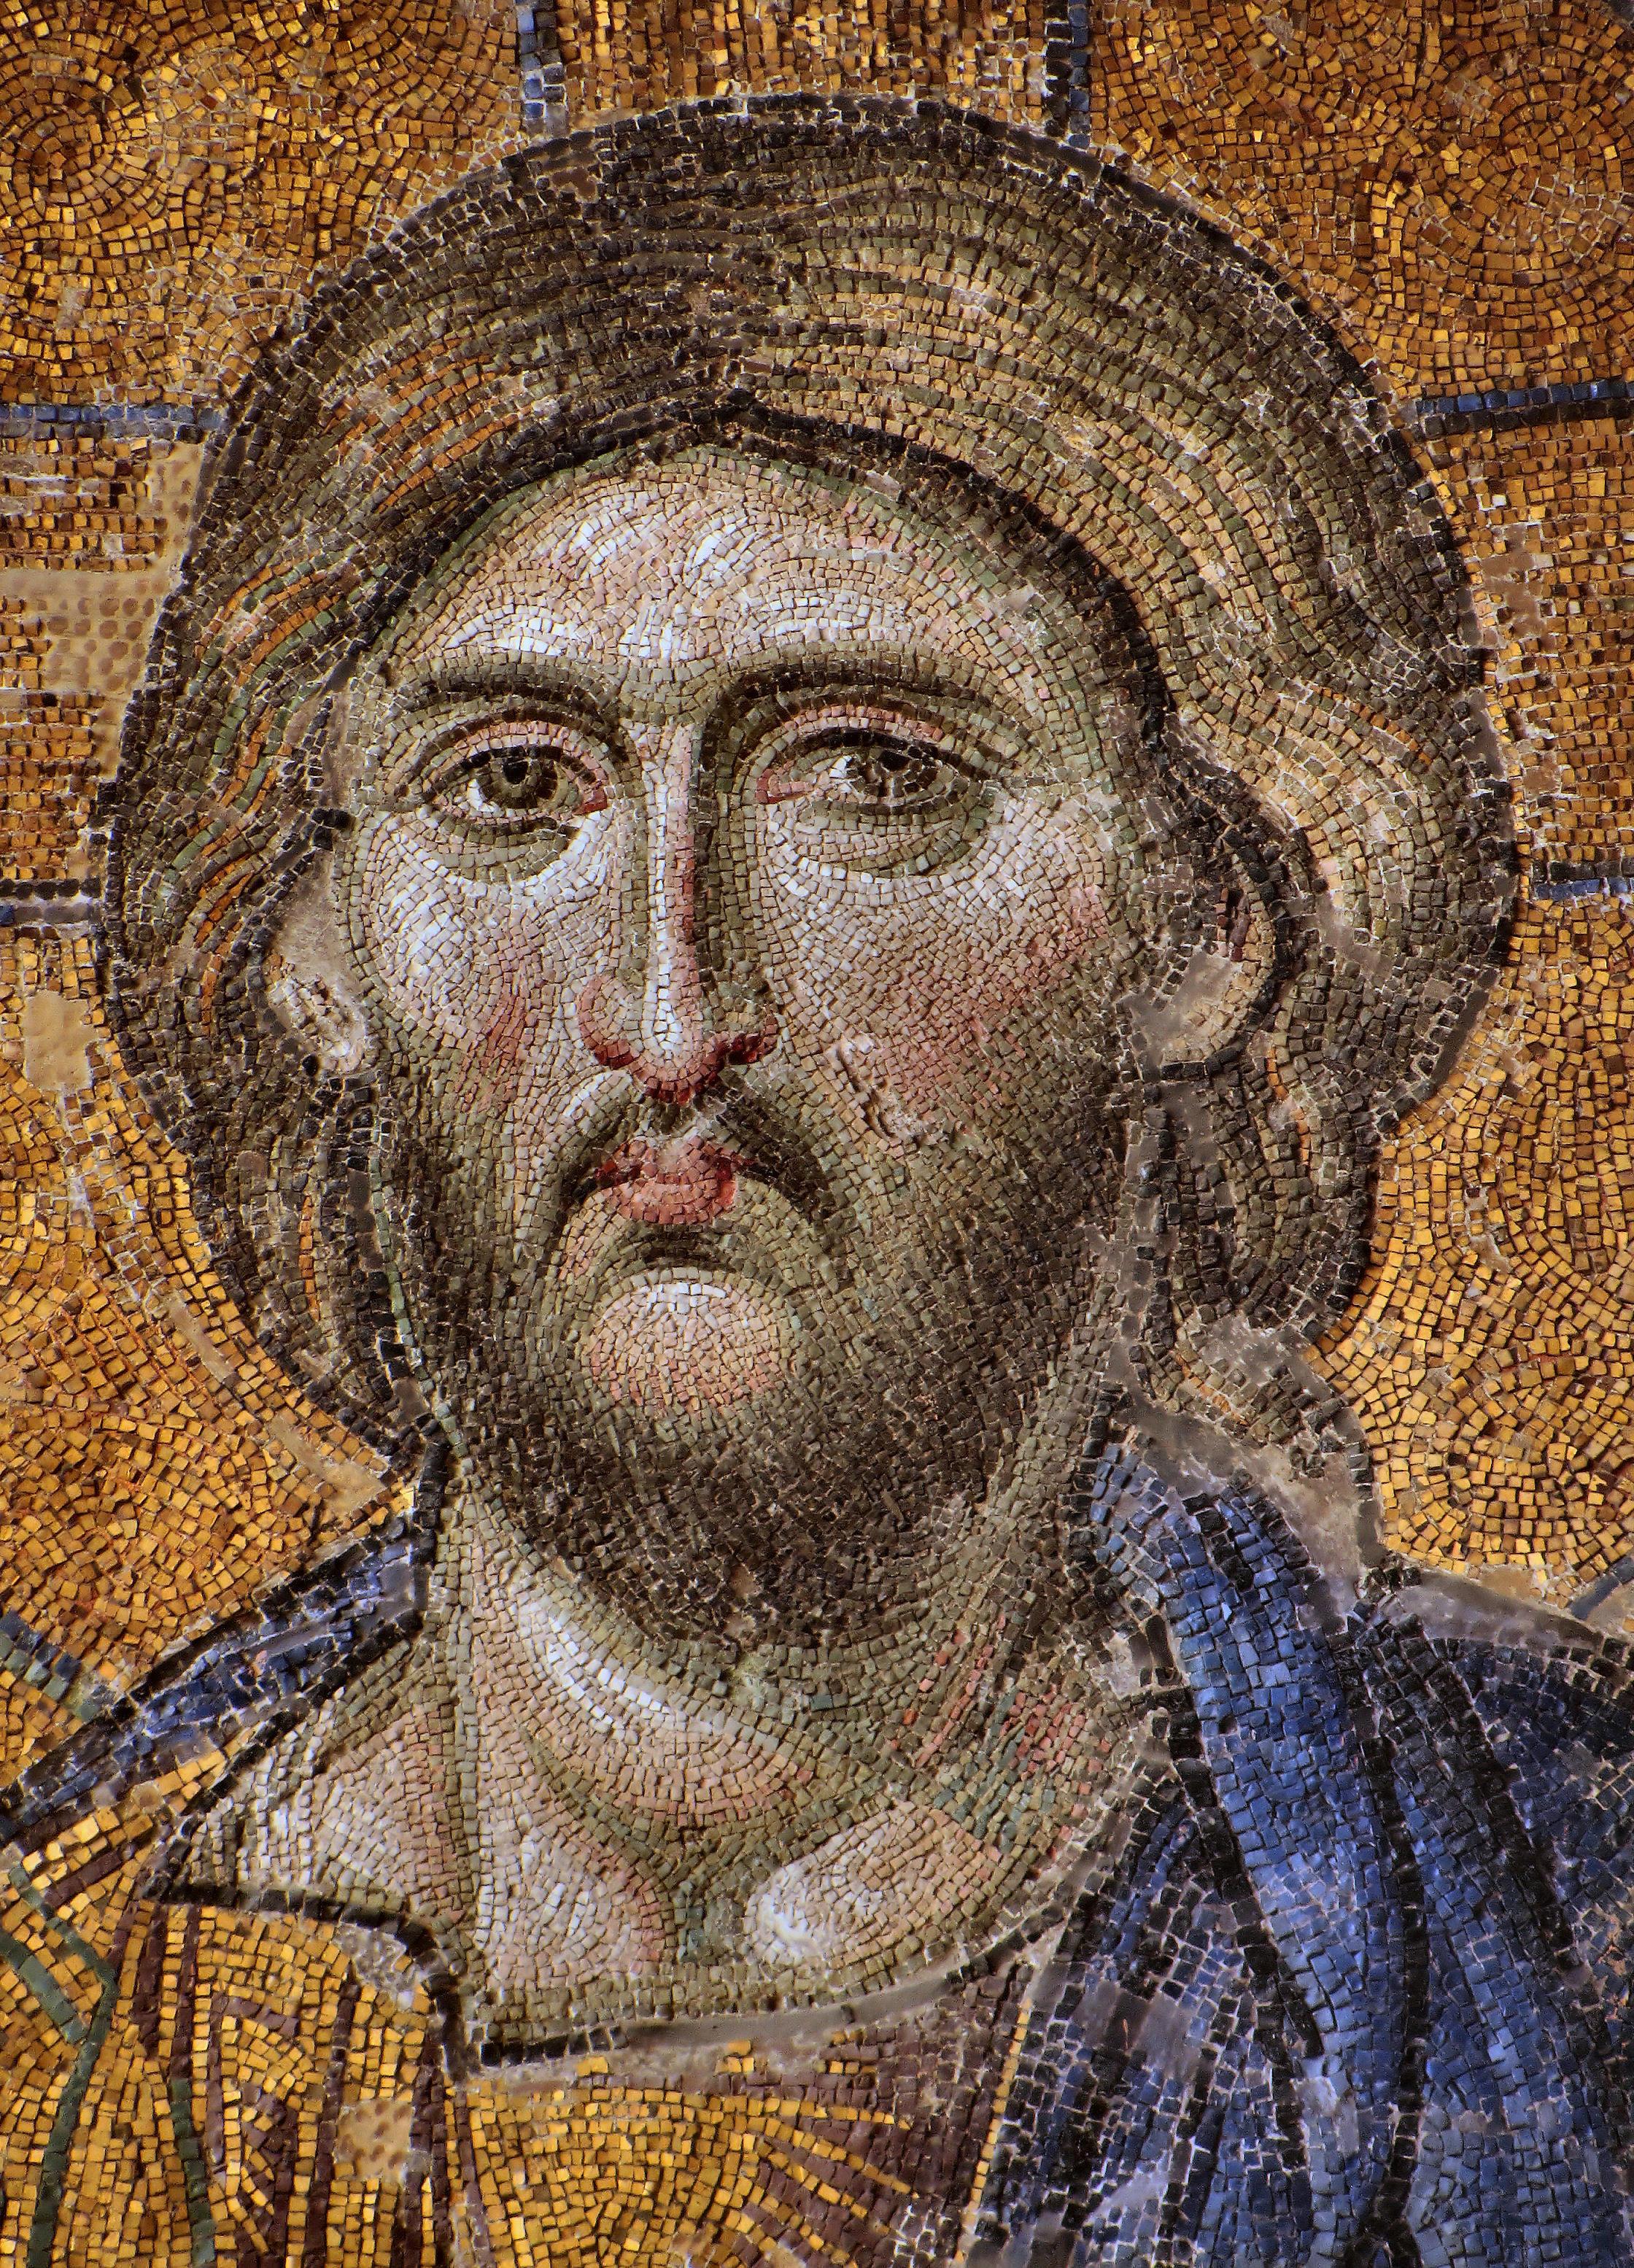 mcmurphy as a christ figure essay